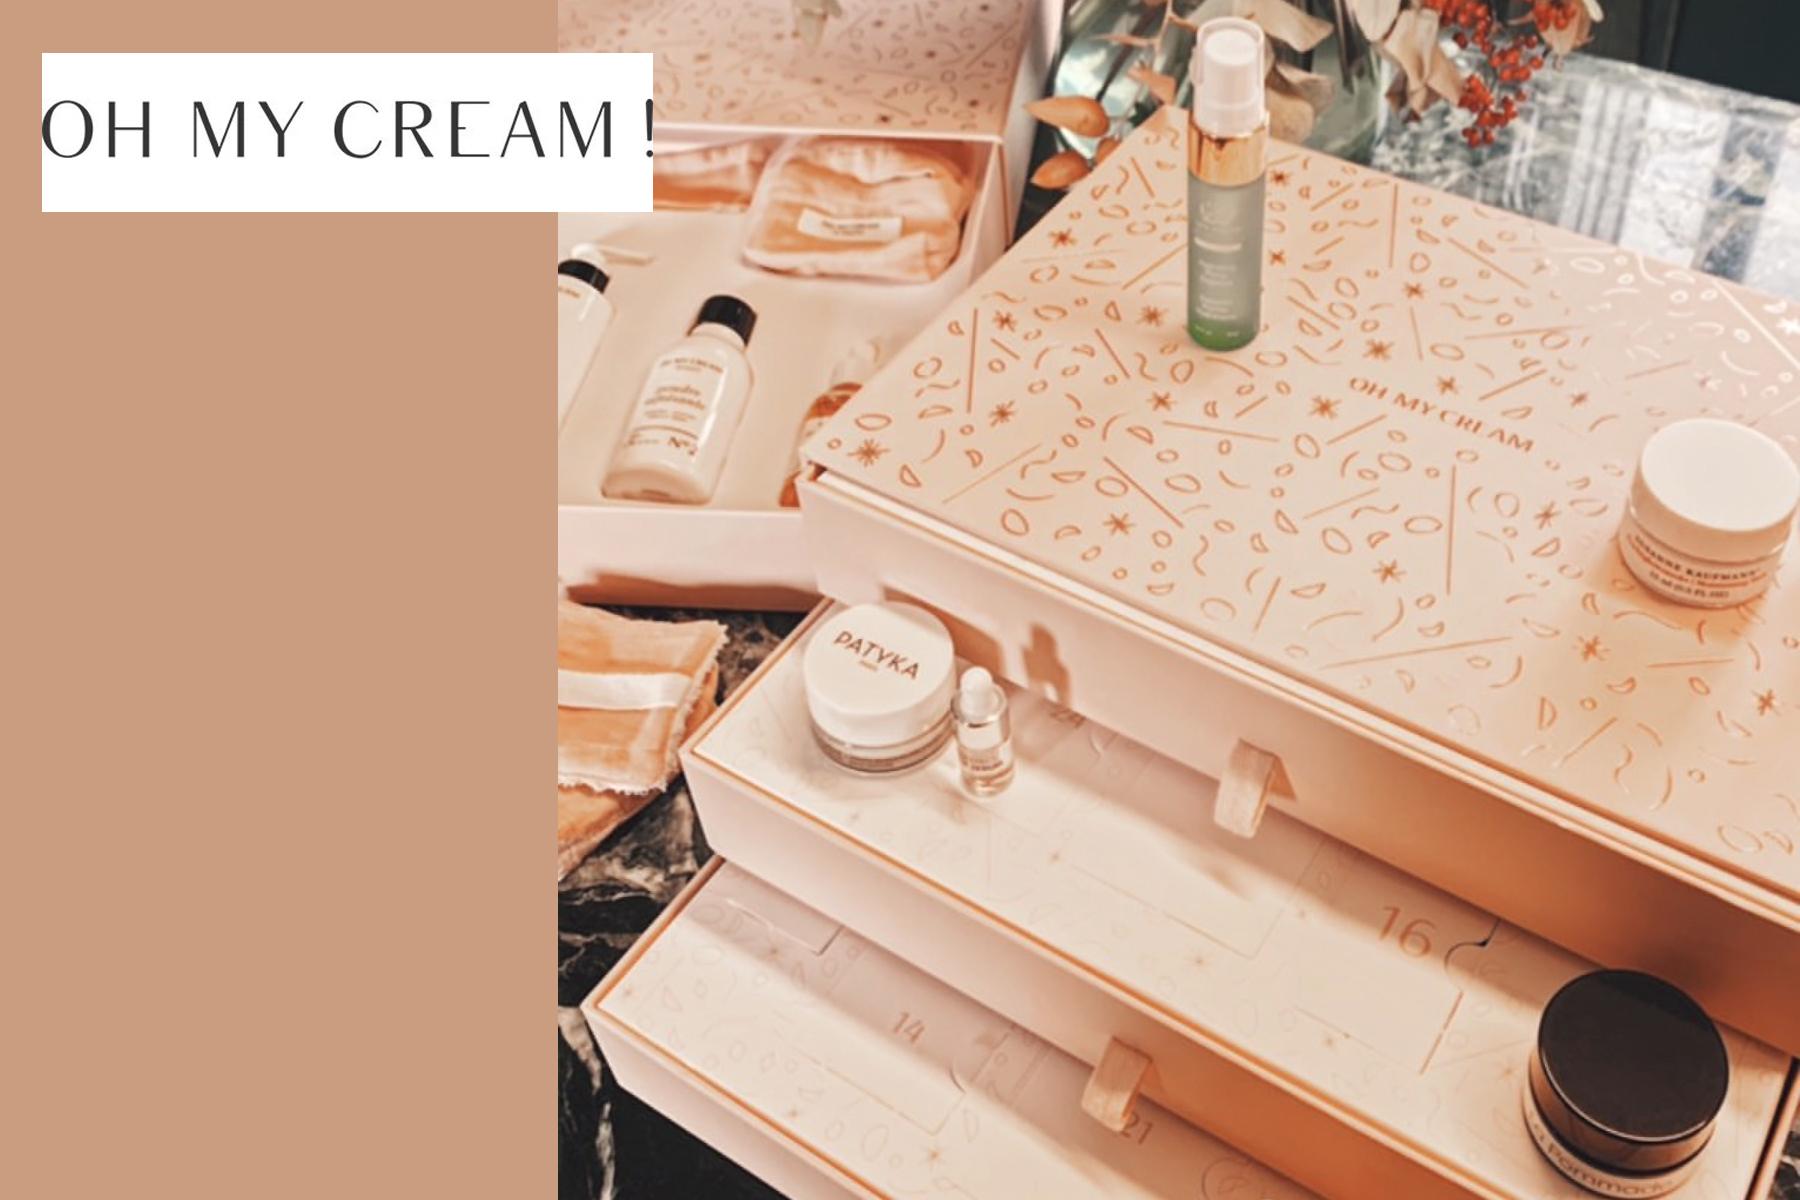 oh my cream calendrier de lavent 2019 contenu